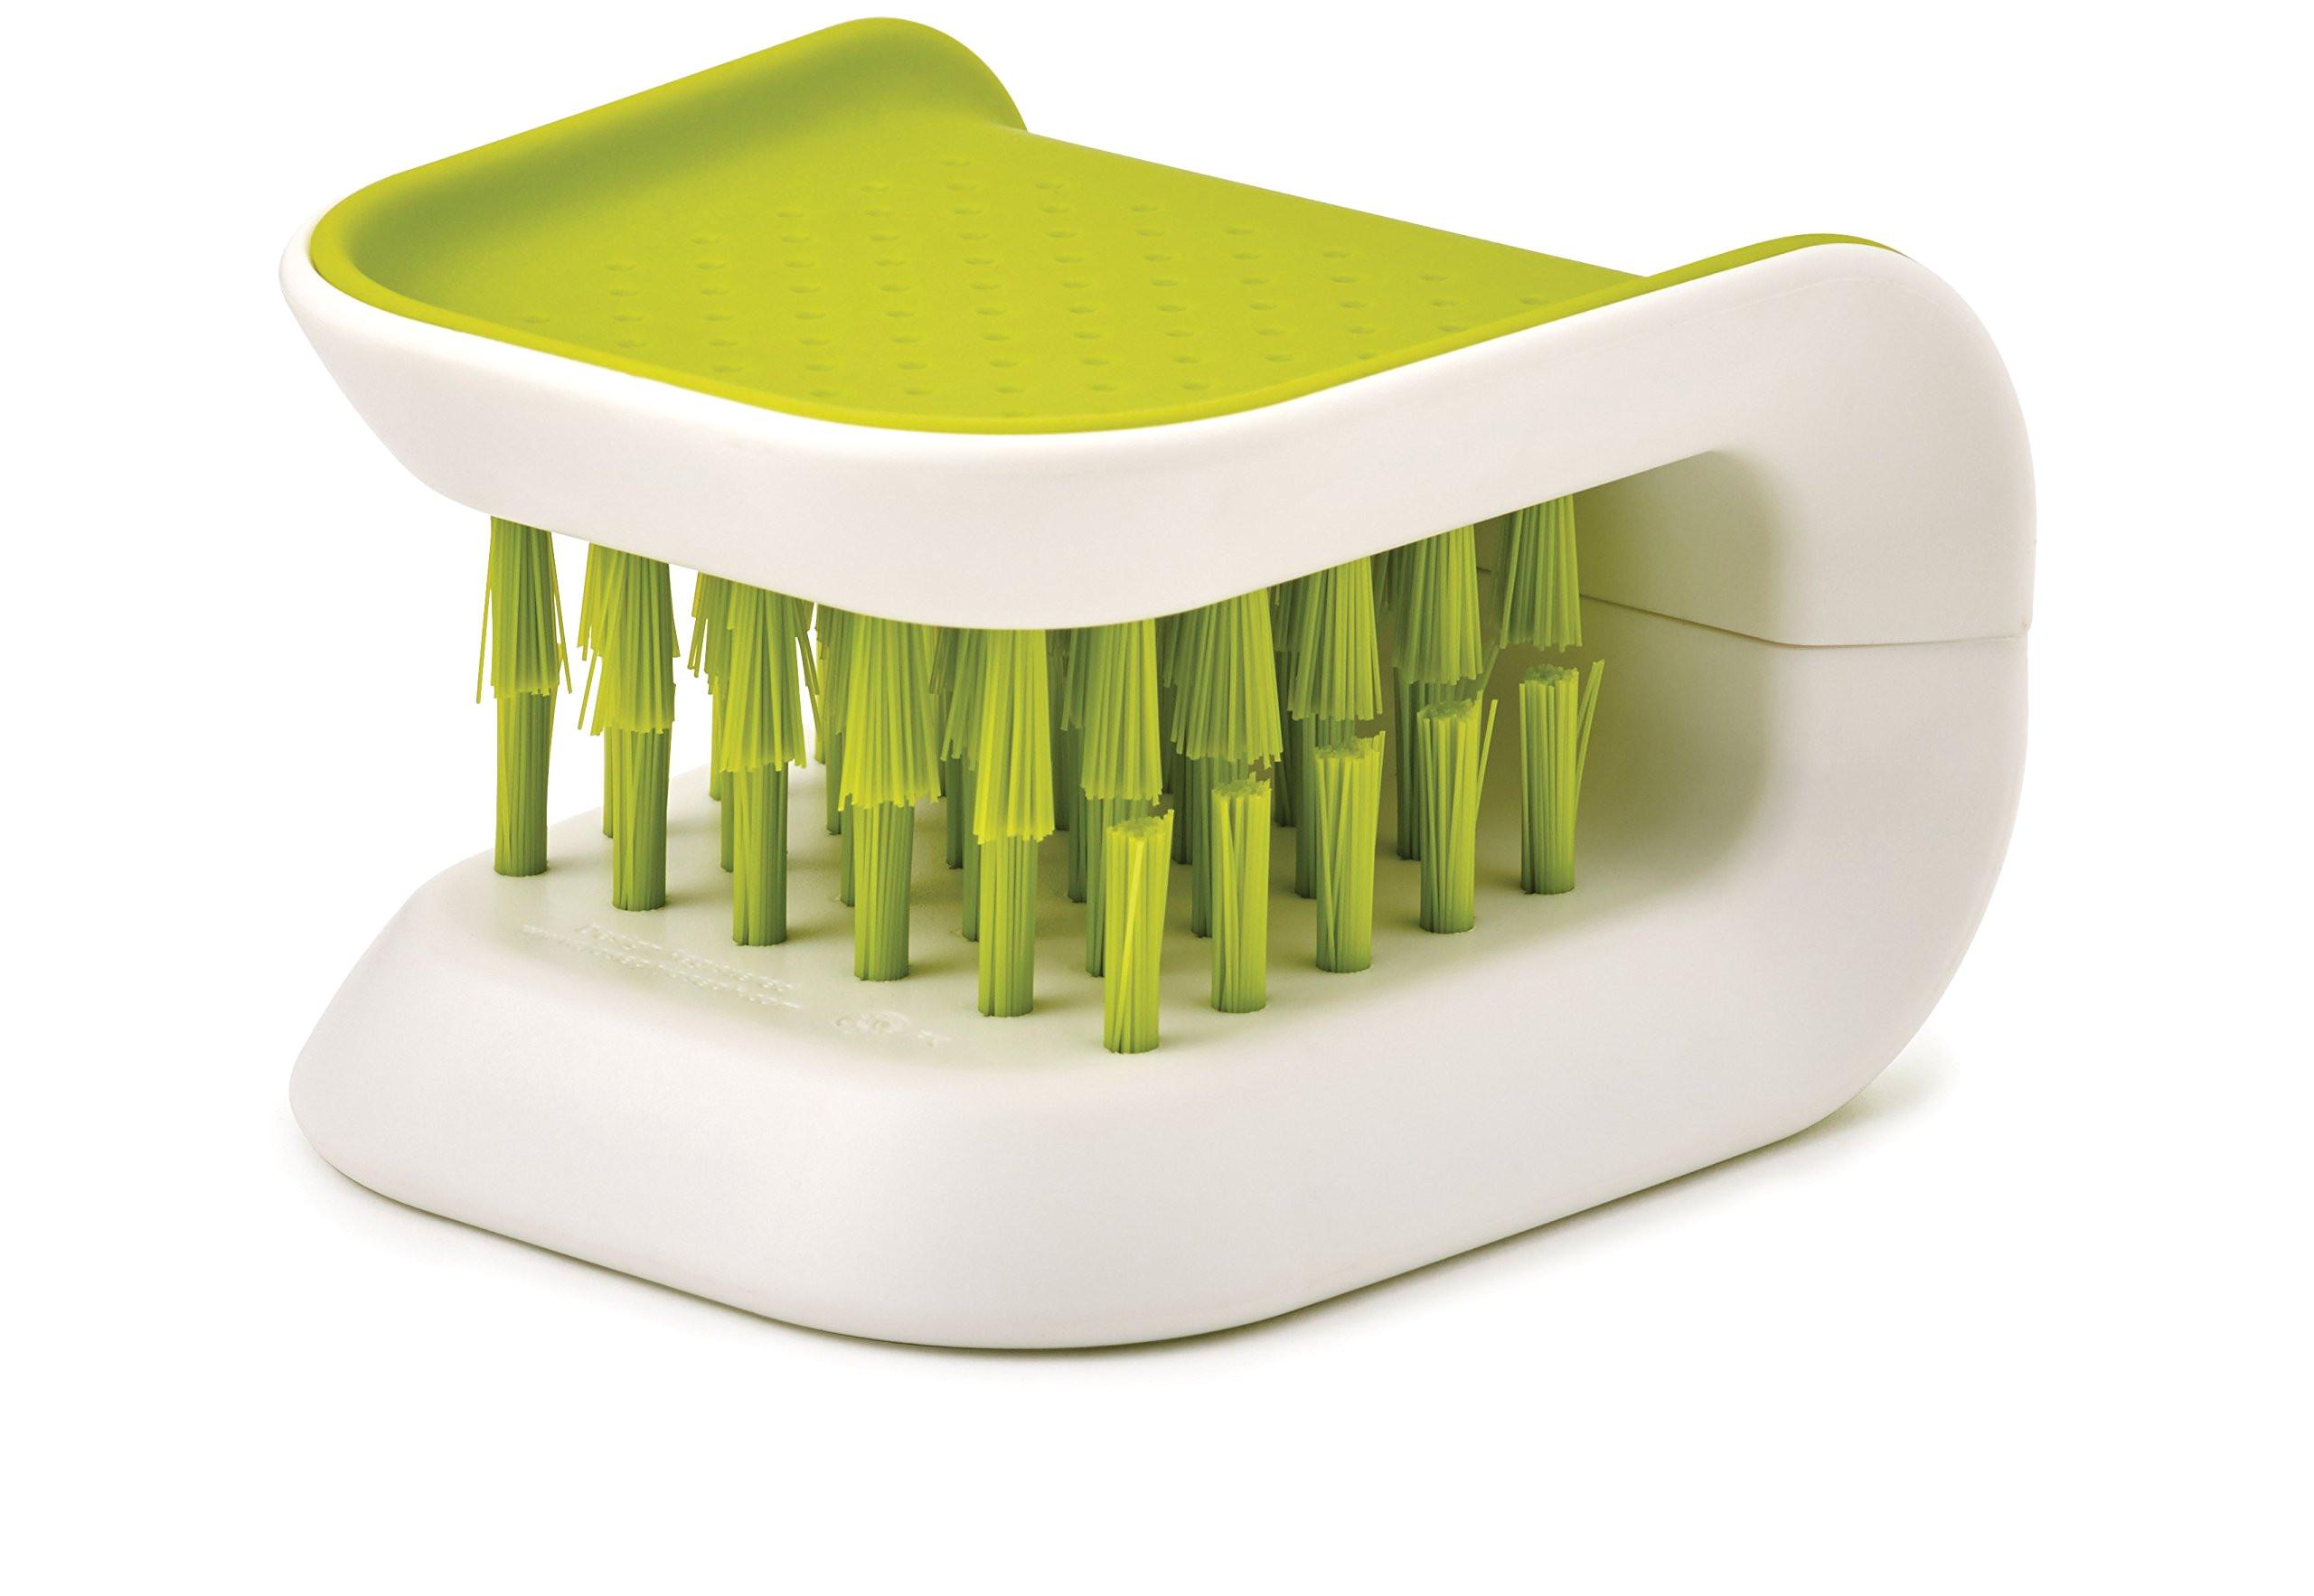 amazon com joseph joseph 85105 bladebrush knife and cutlery cleaner brush bristle scrub kitchen washing non slip one size green kitchen dining